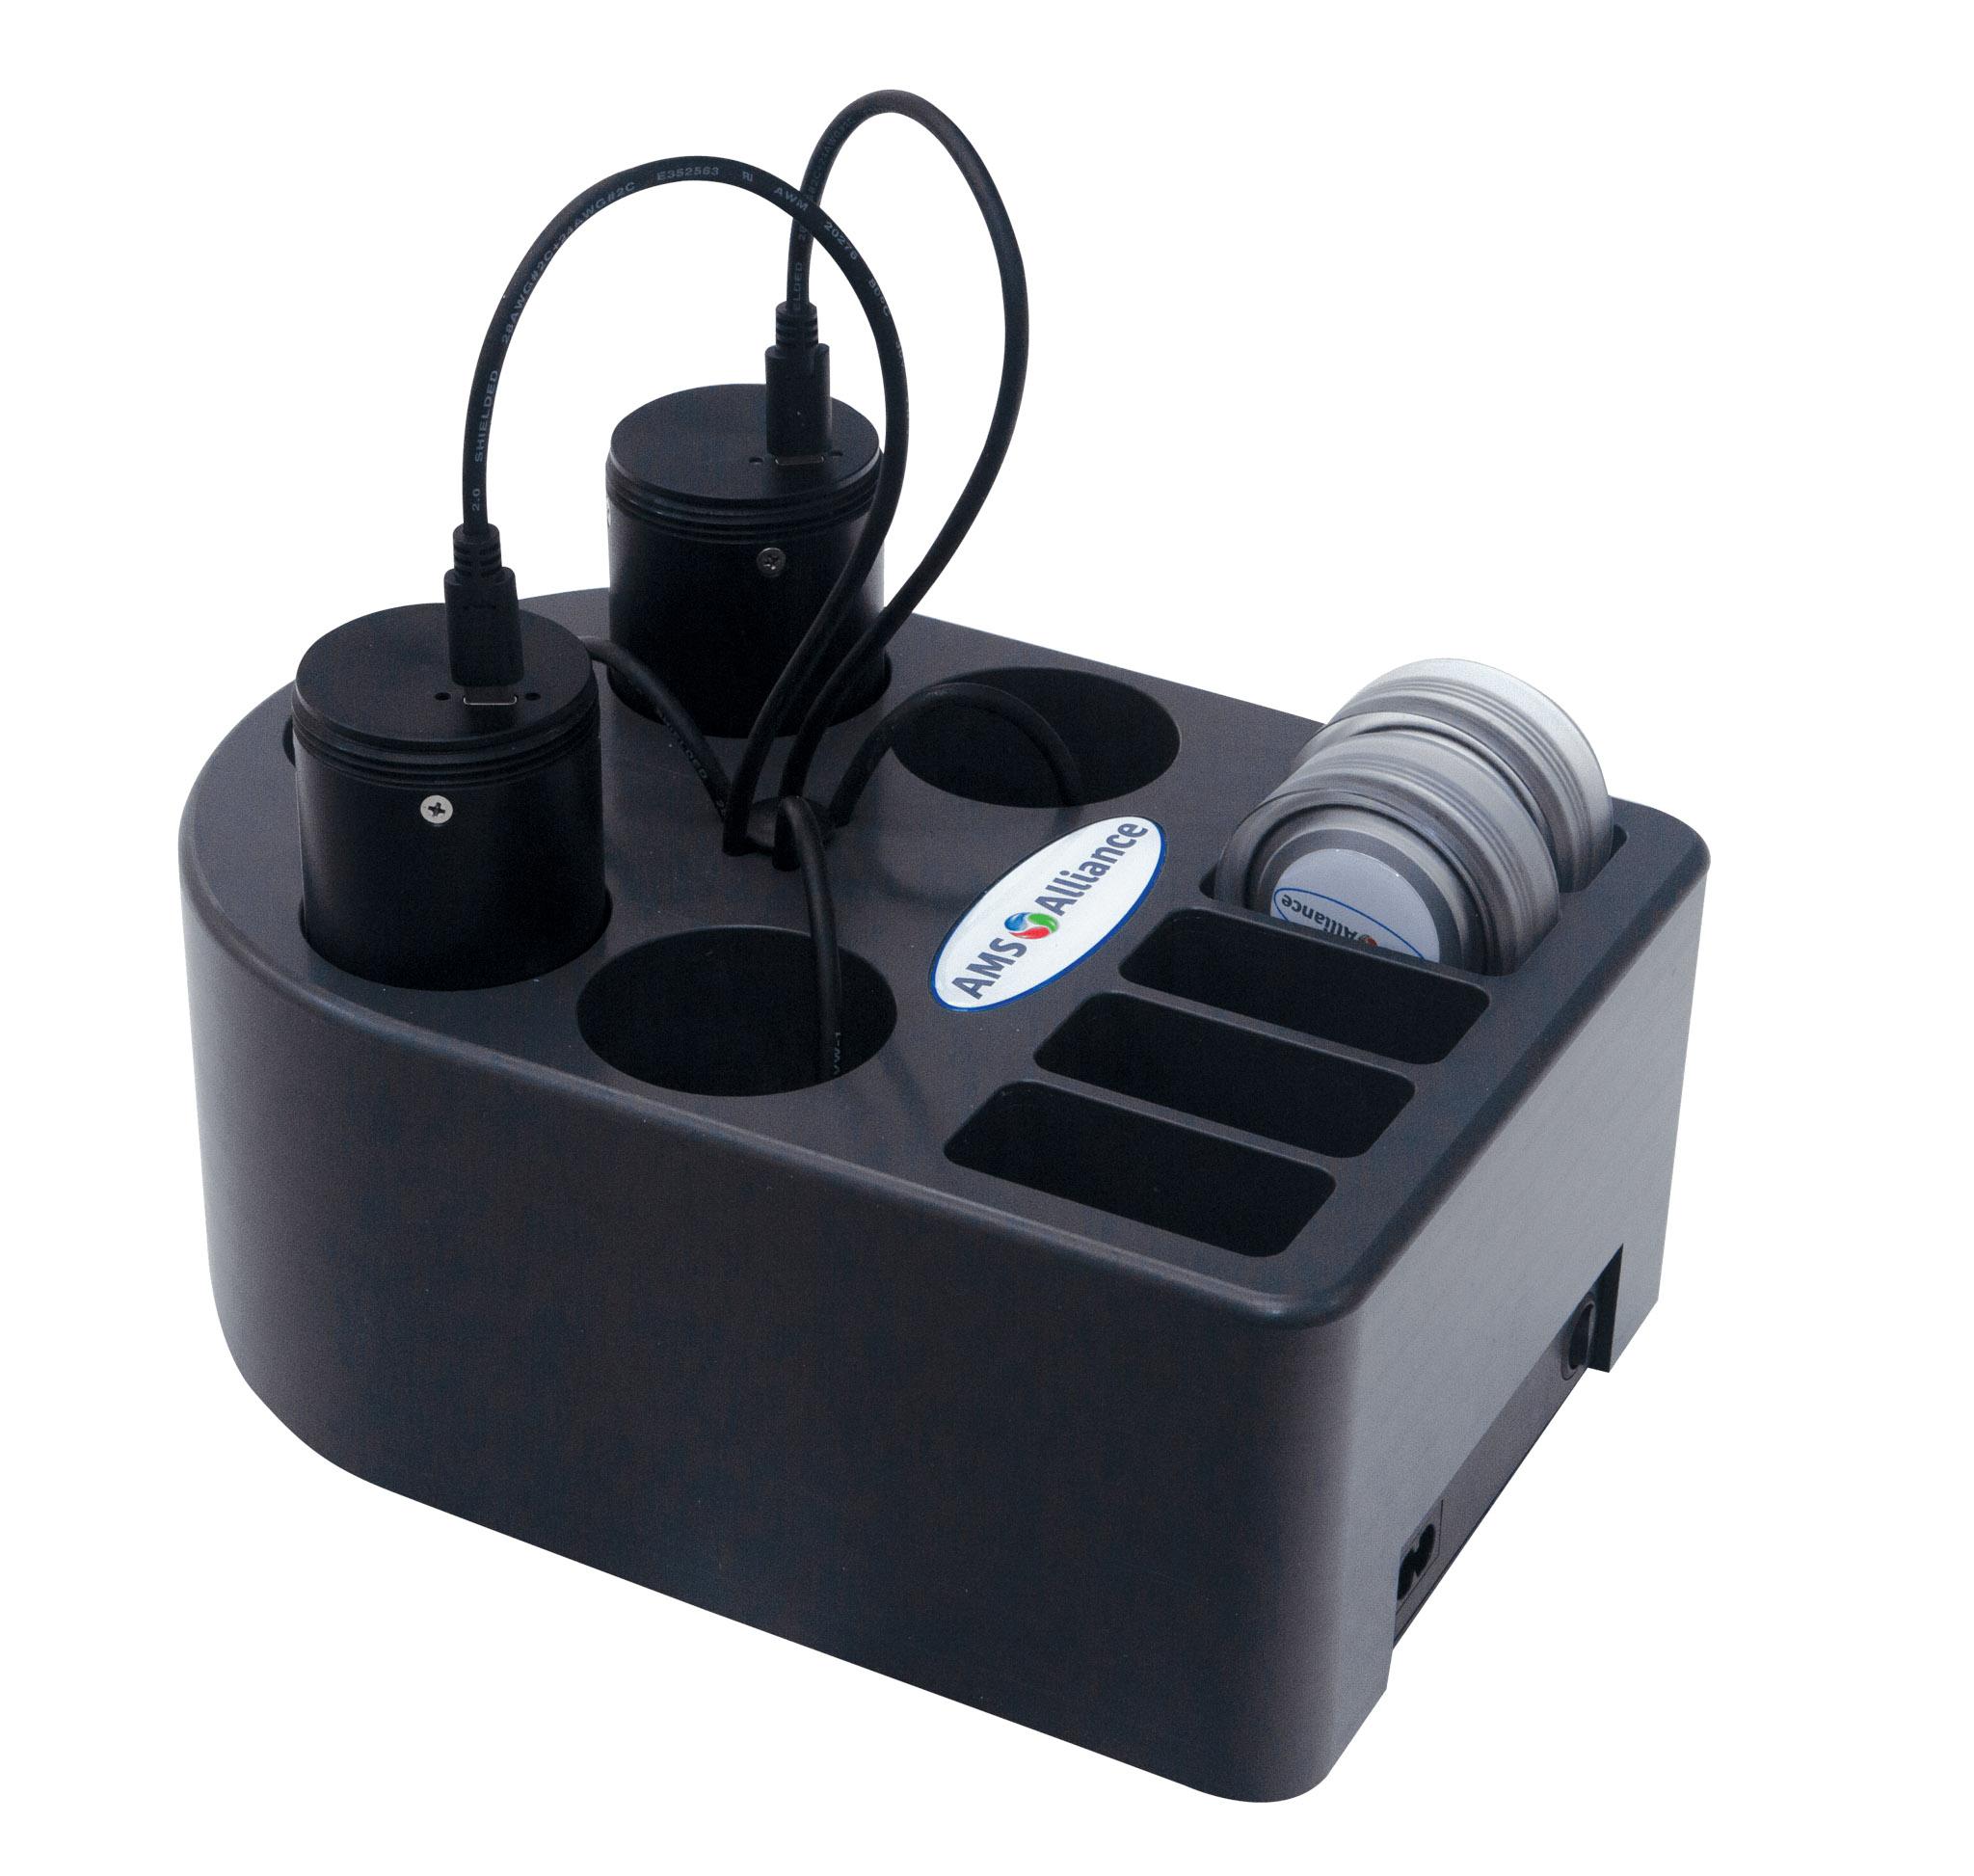 iCinac Wireless